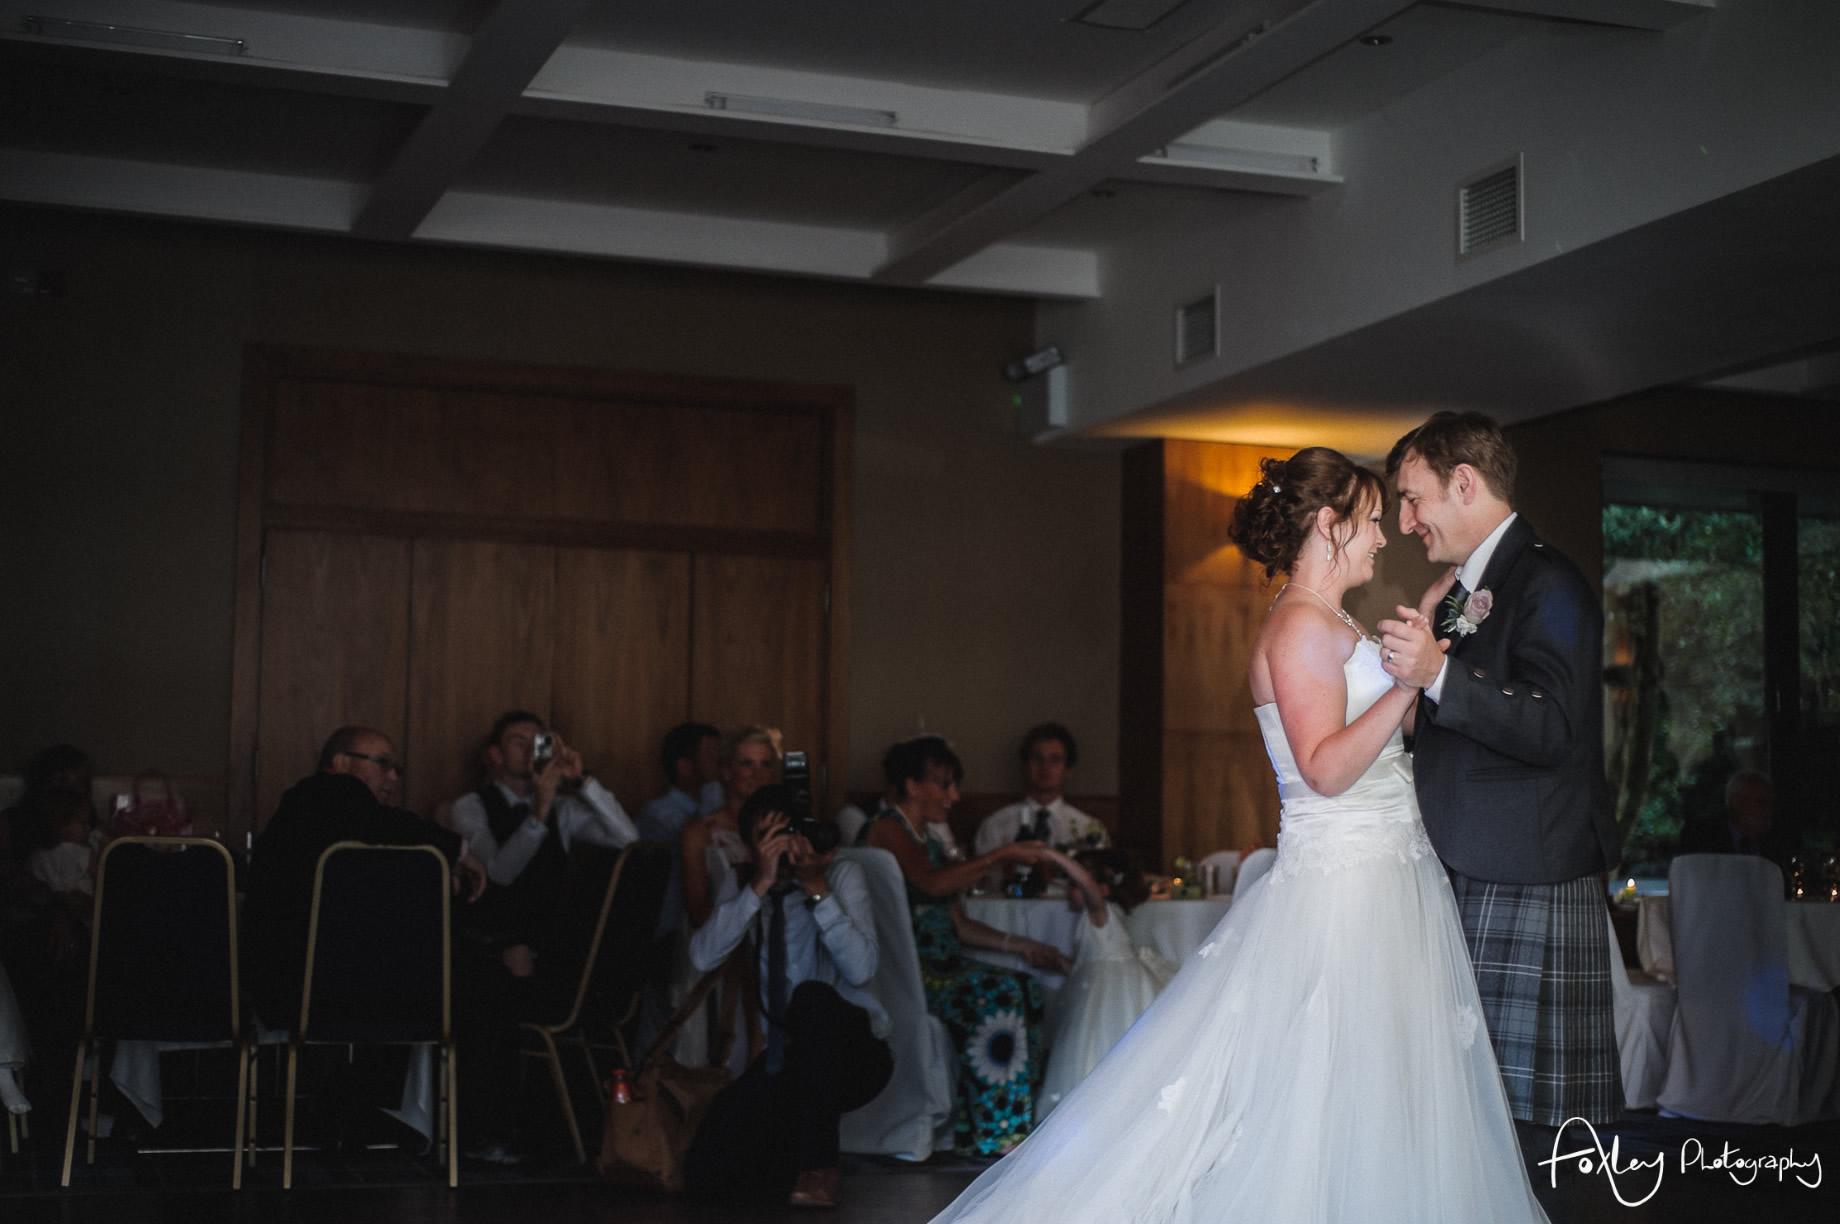 Alys-And-Davids-Wedding-Loch-Lomond-162